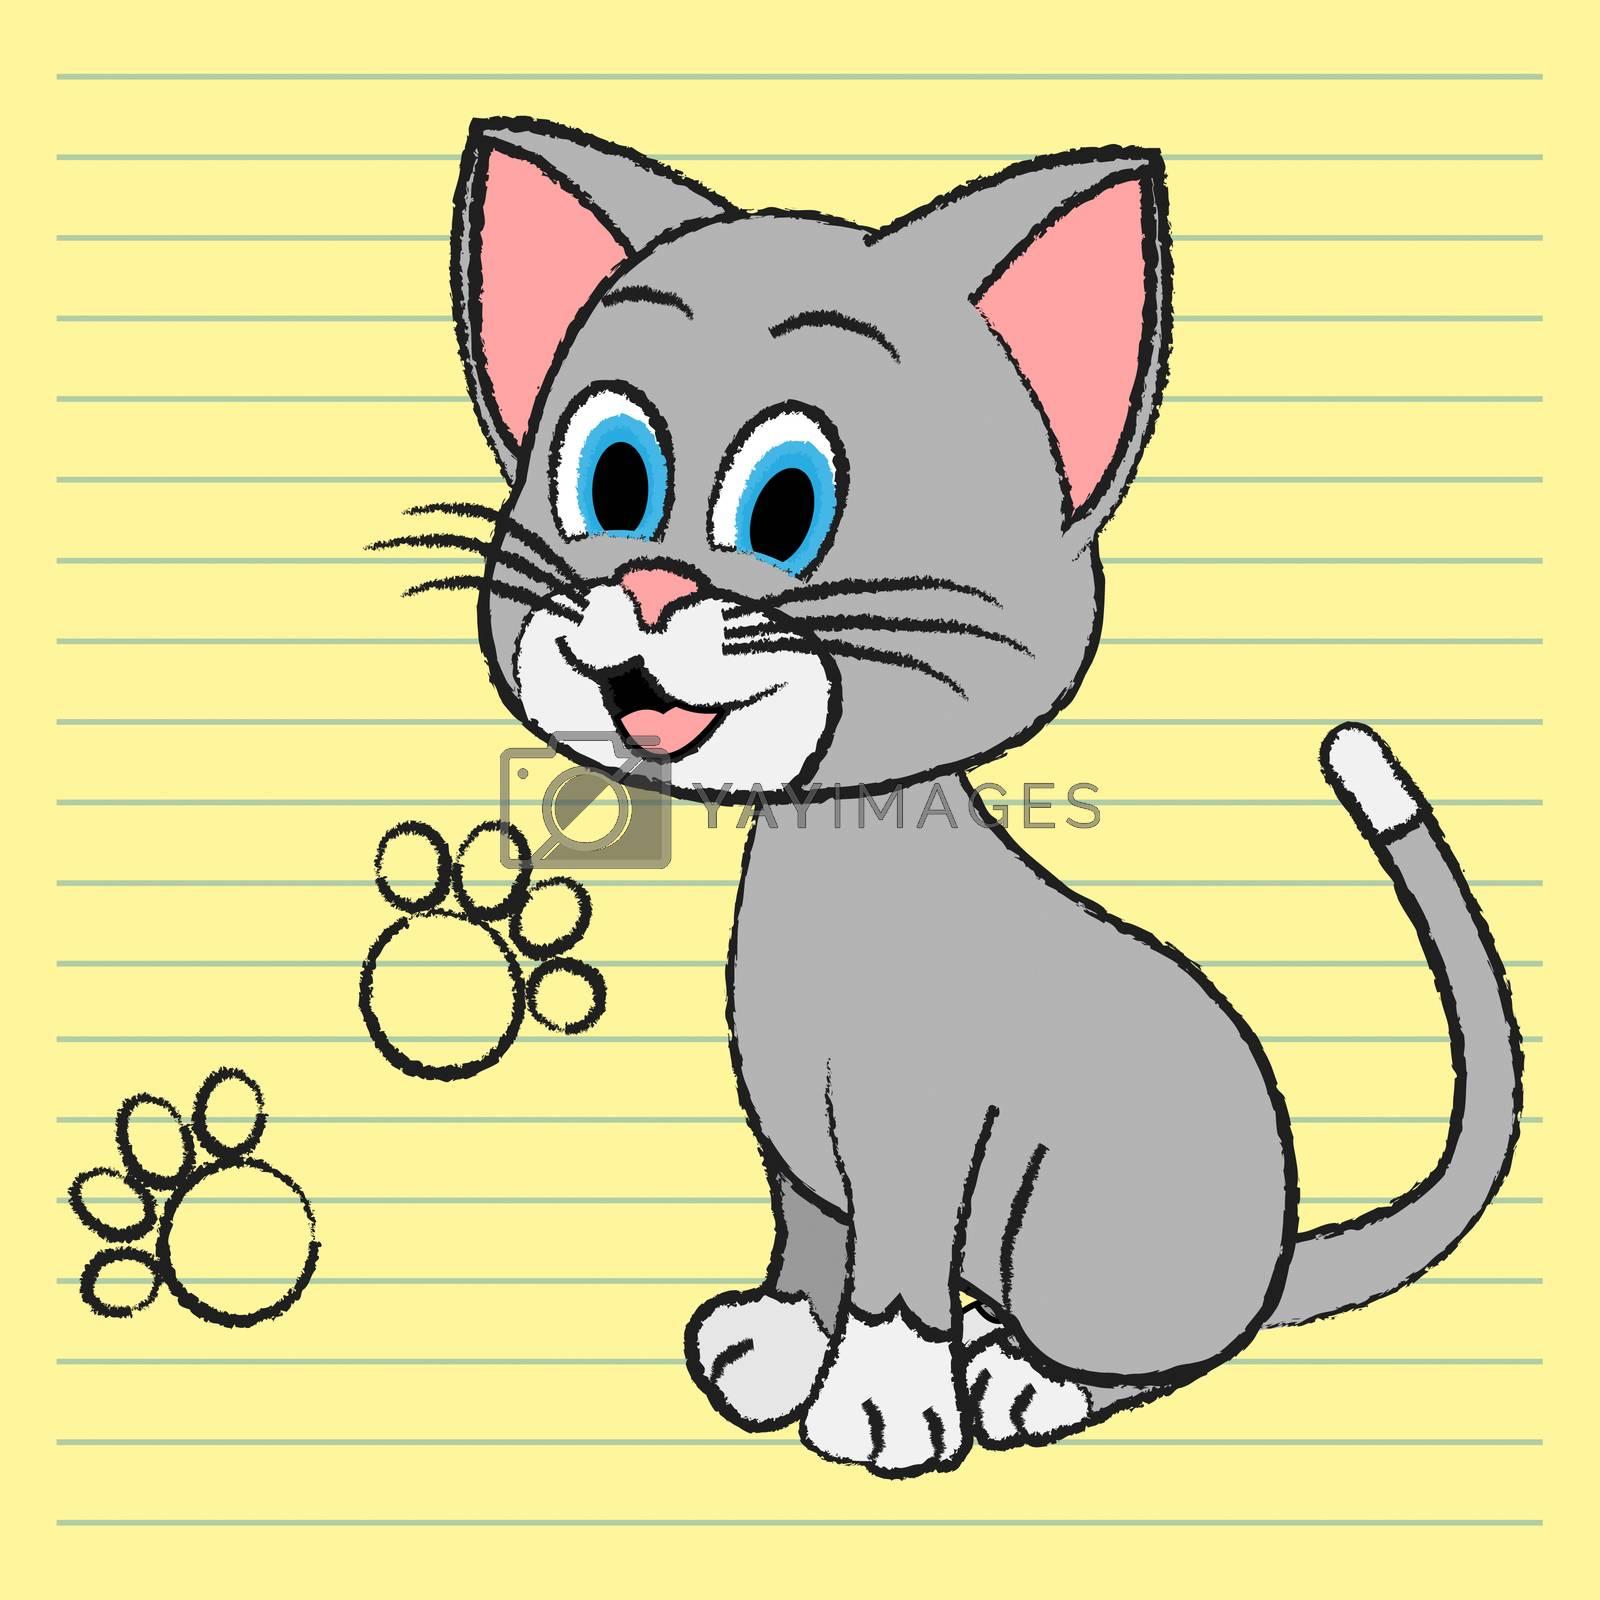 Cute Cat Indicating Feline Pedigree And Kitten